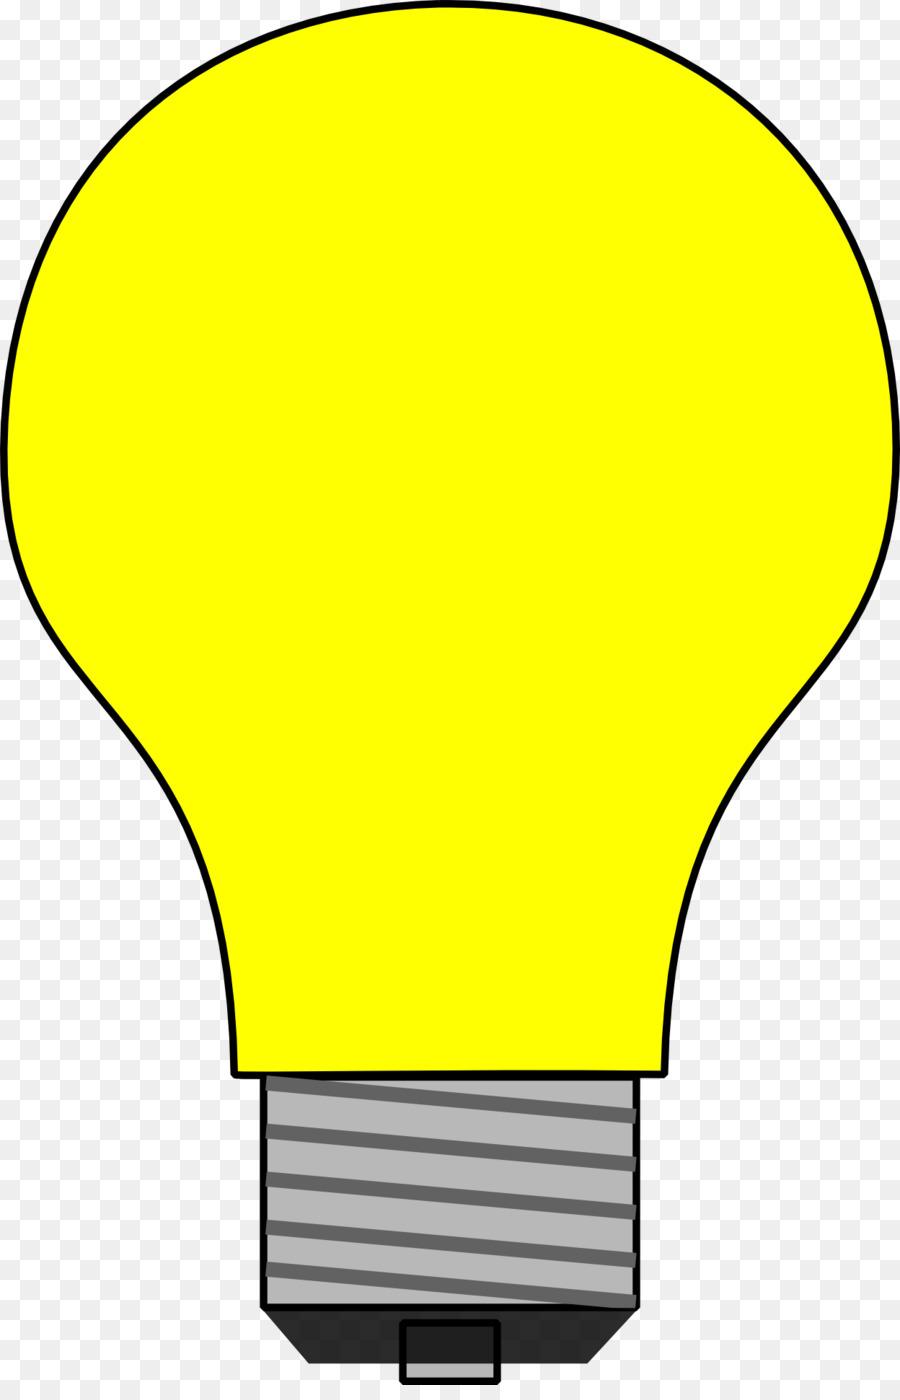 900x1400 Incandescent Light Bulb Christmas Lights Clip Art